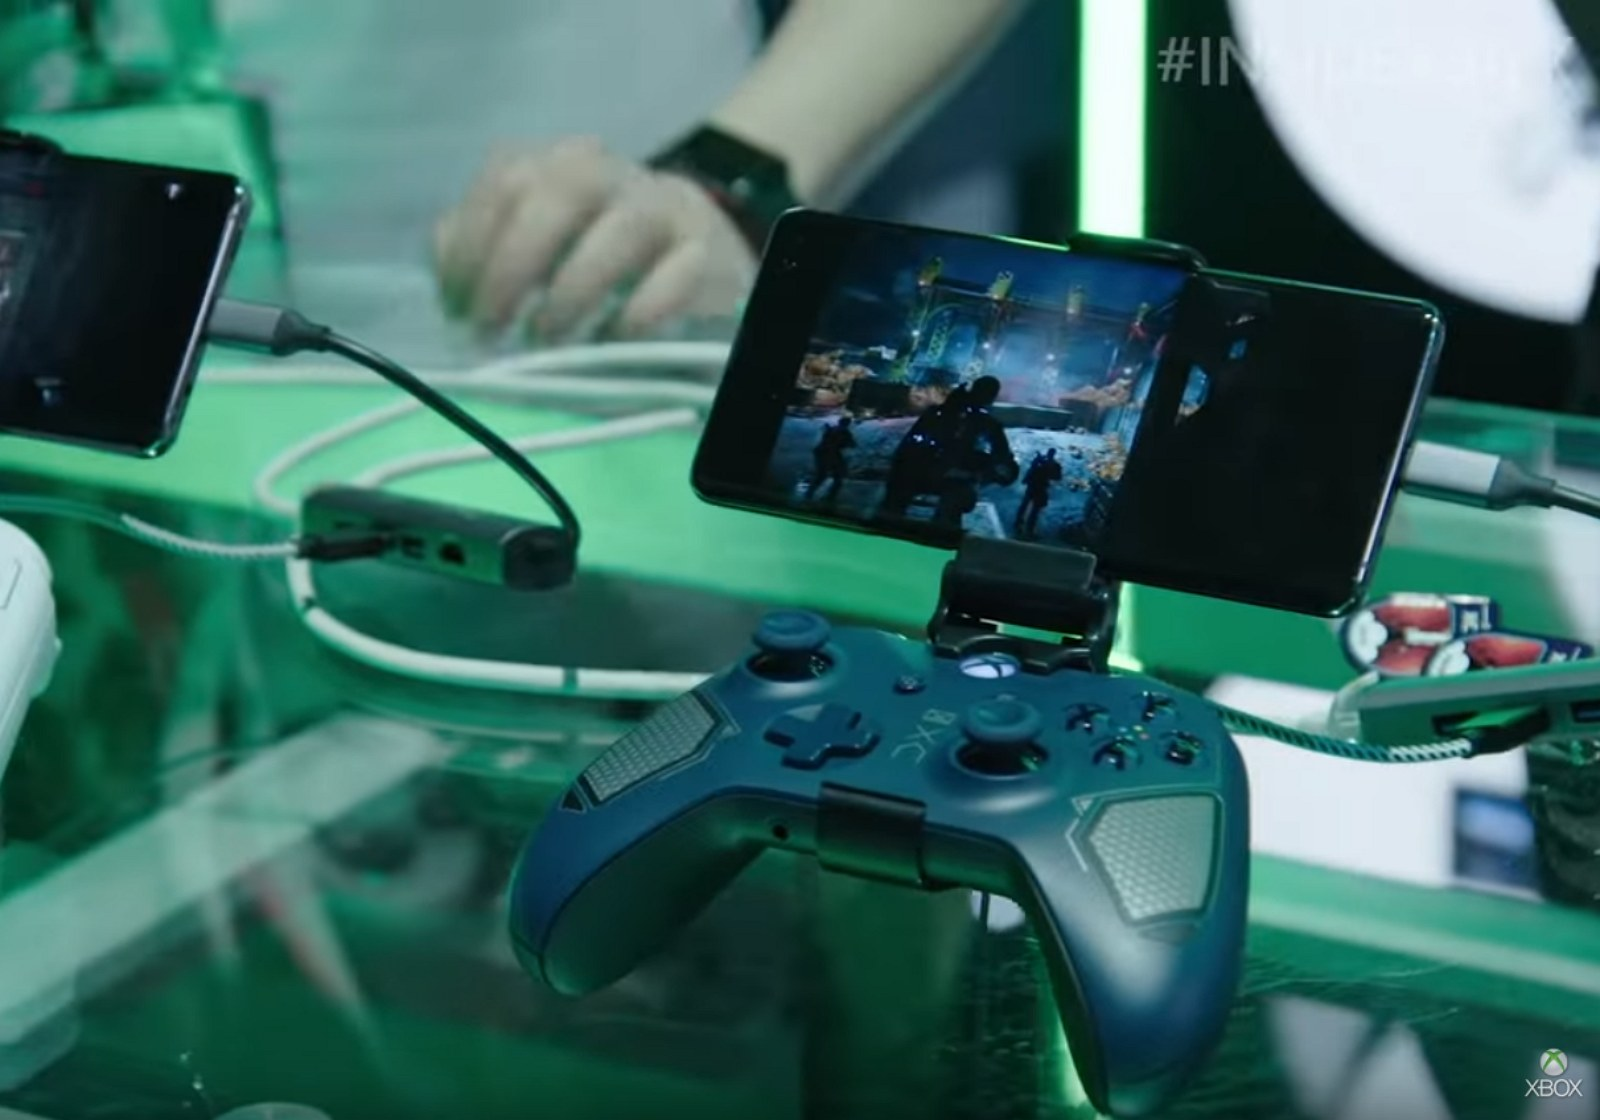 Xbox xCloud preview demo (image source Microsoft)